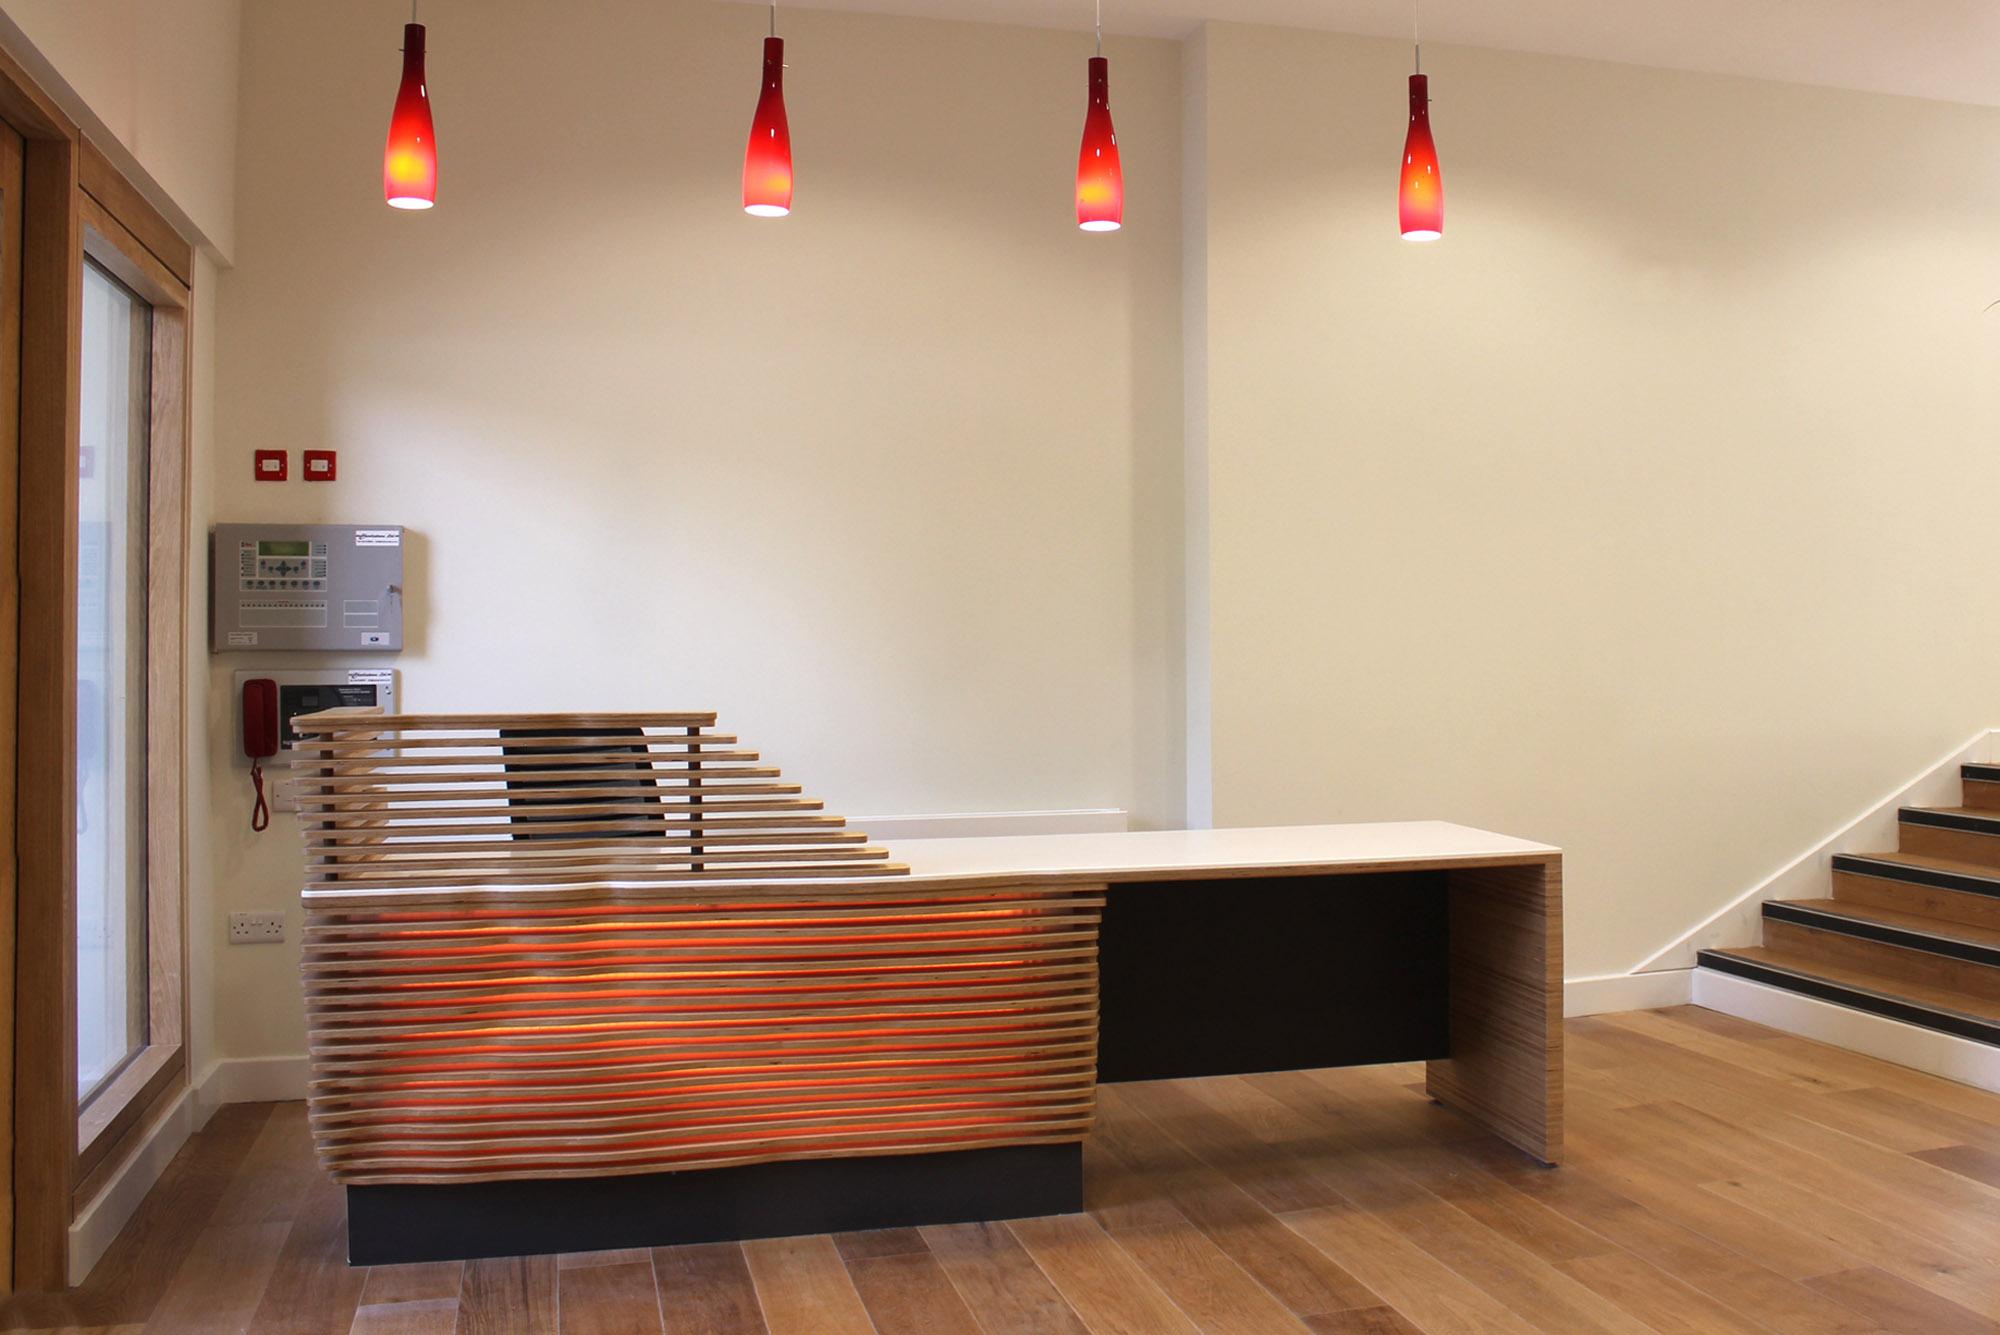 Commercial furniture manufacturering